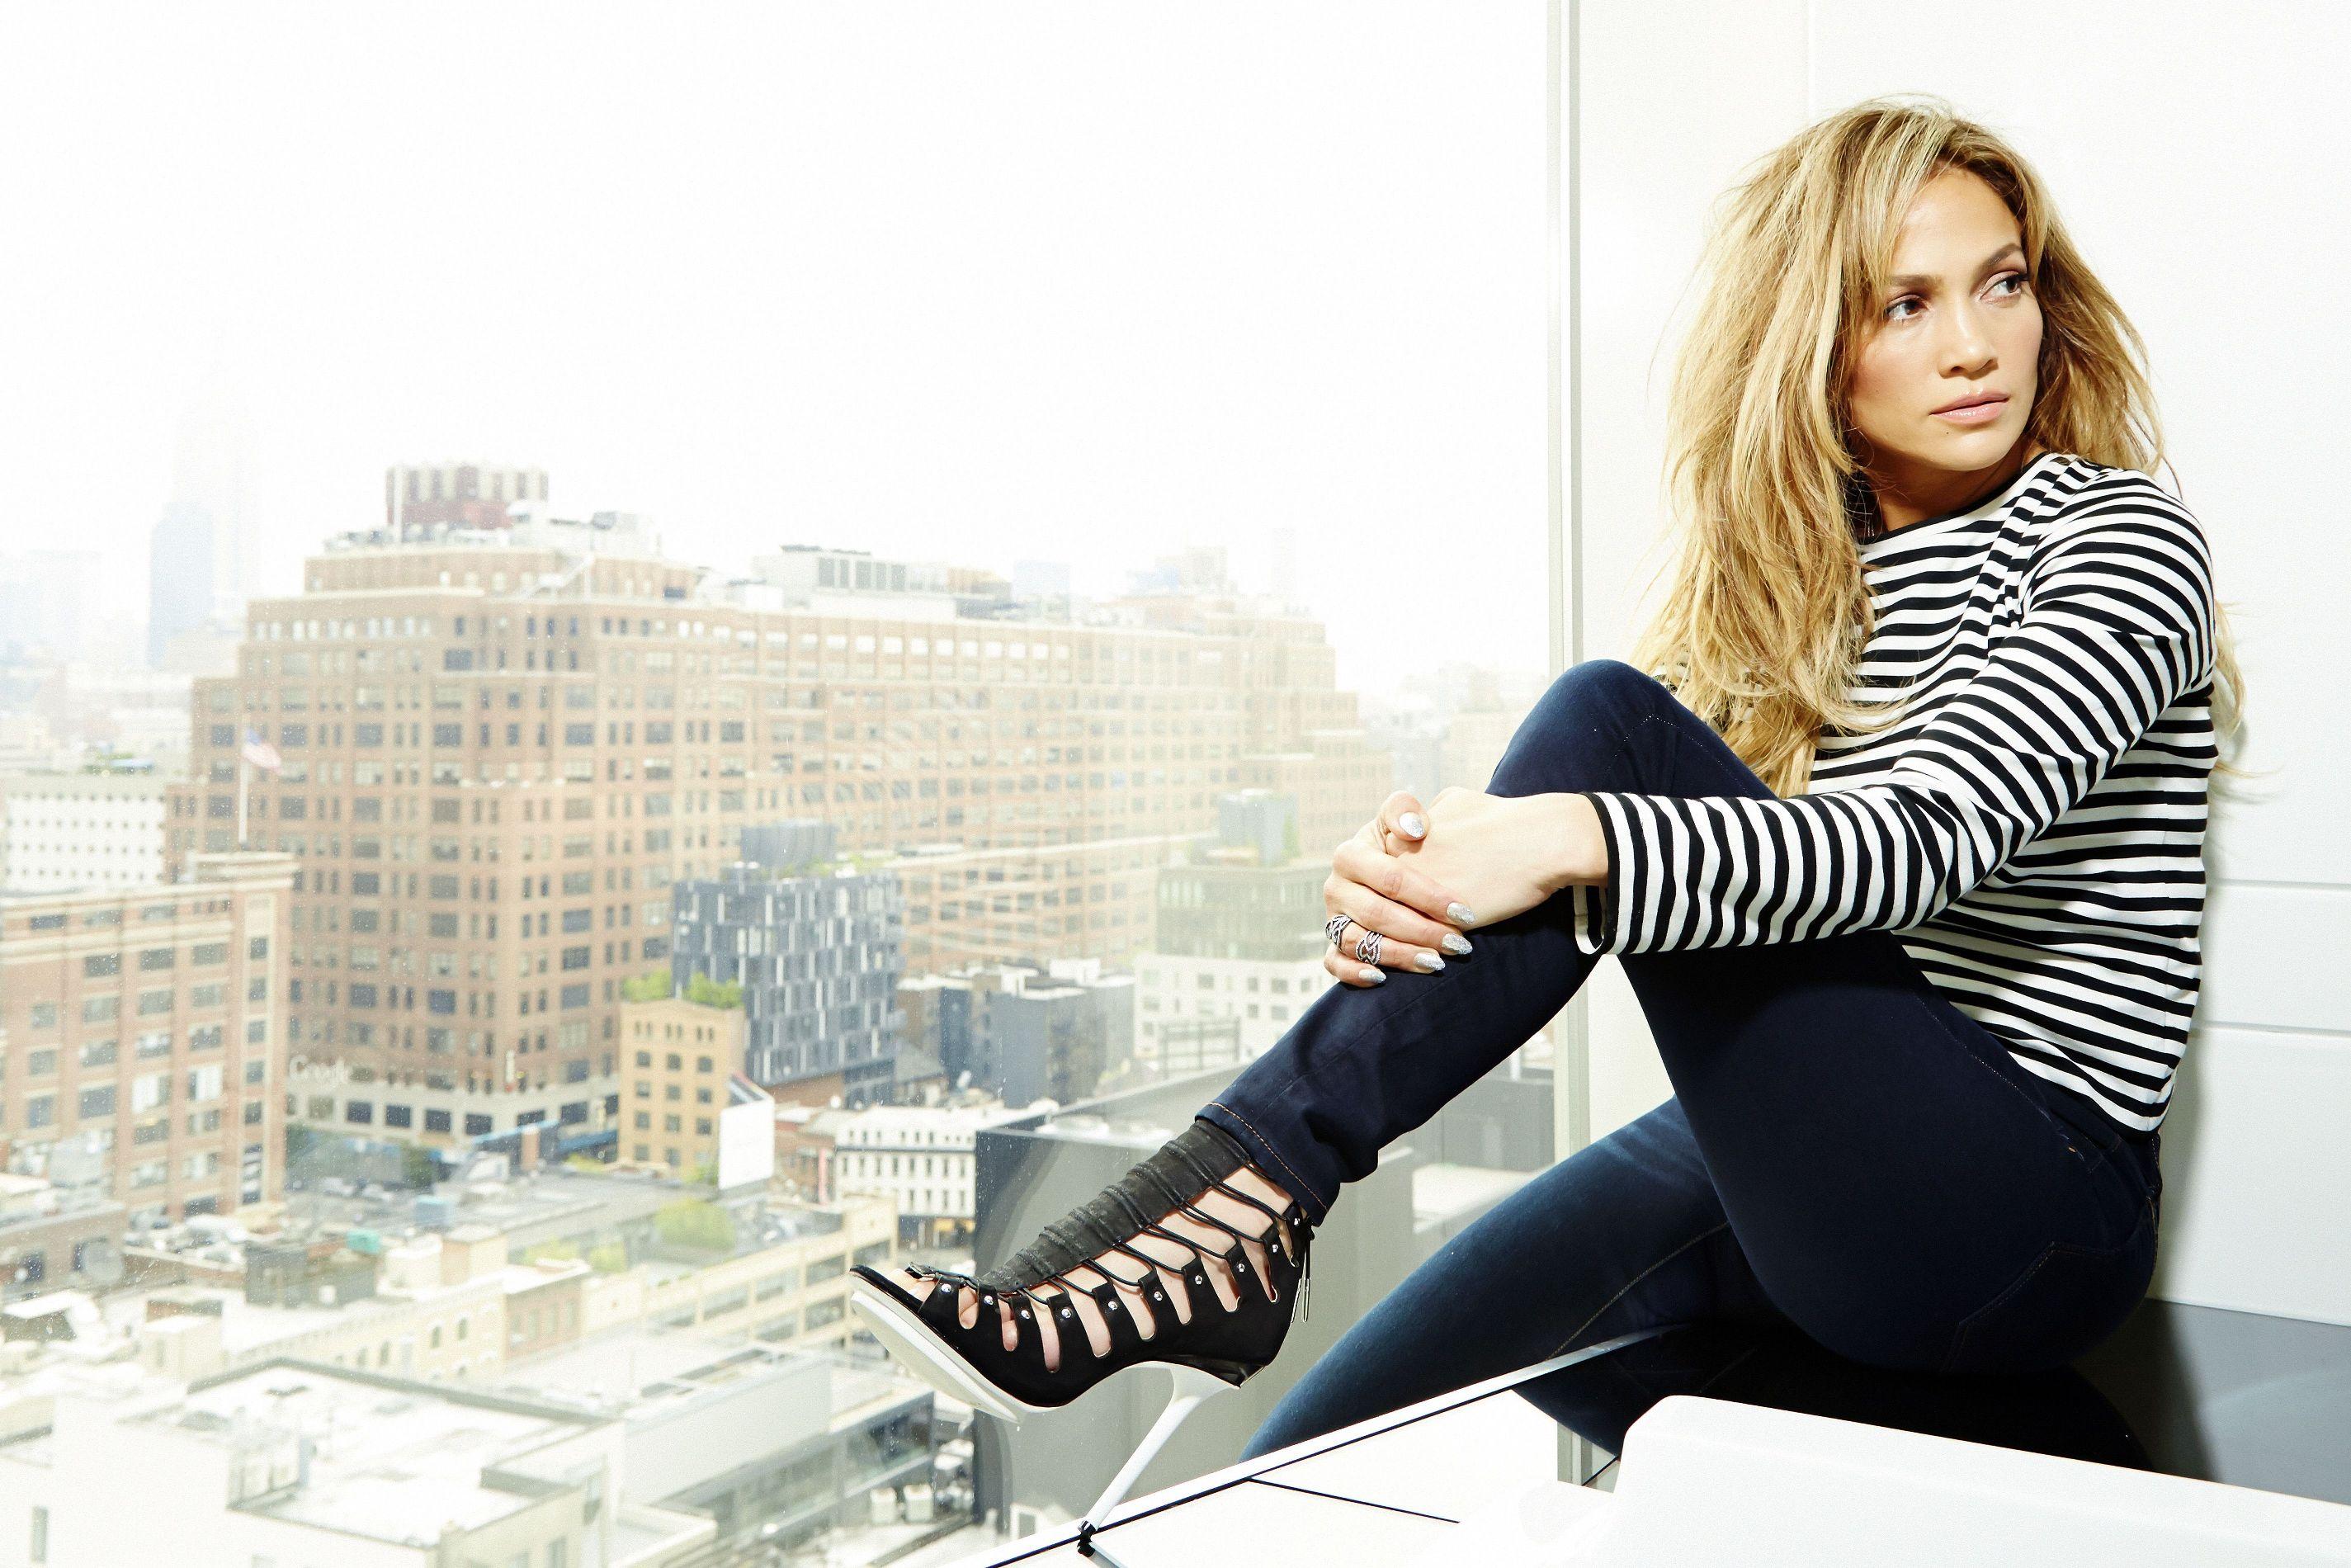 Jennifer Lopez Fondo De Pantalla Hd Fondo De Escritorio